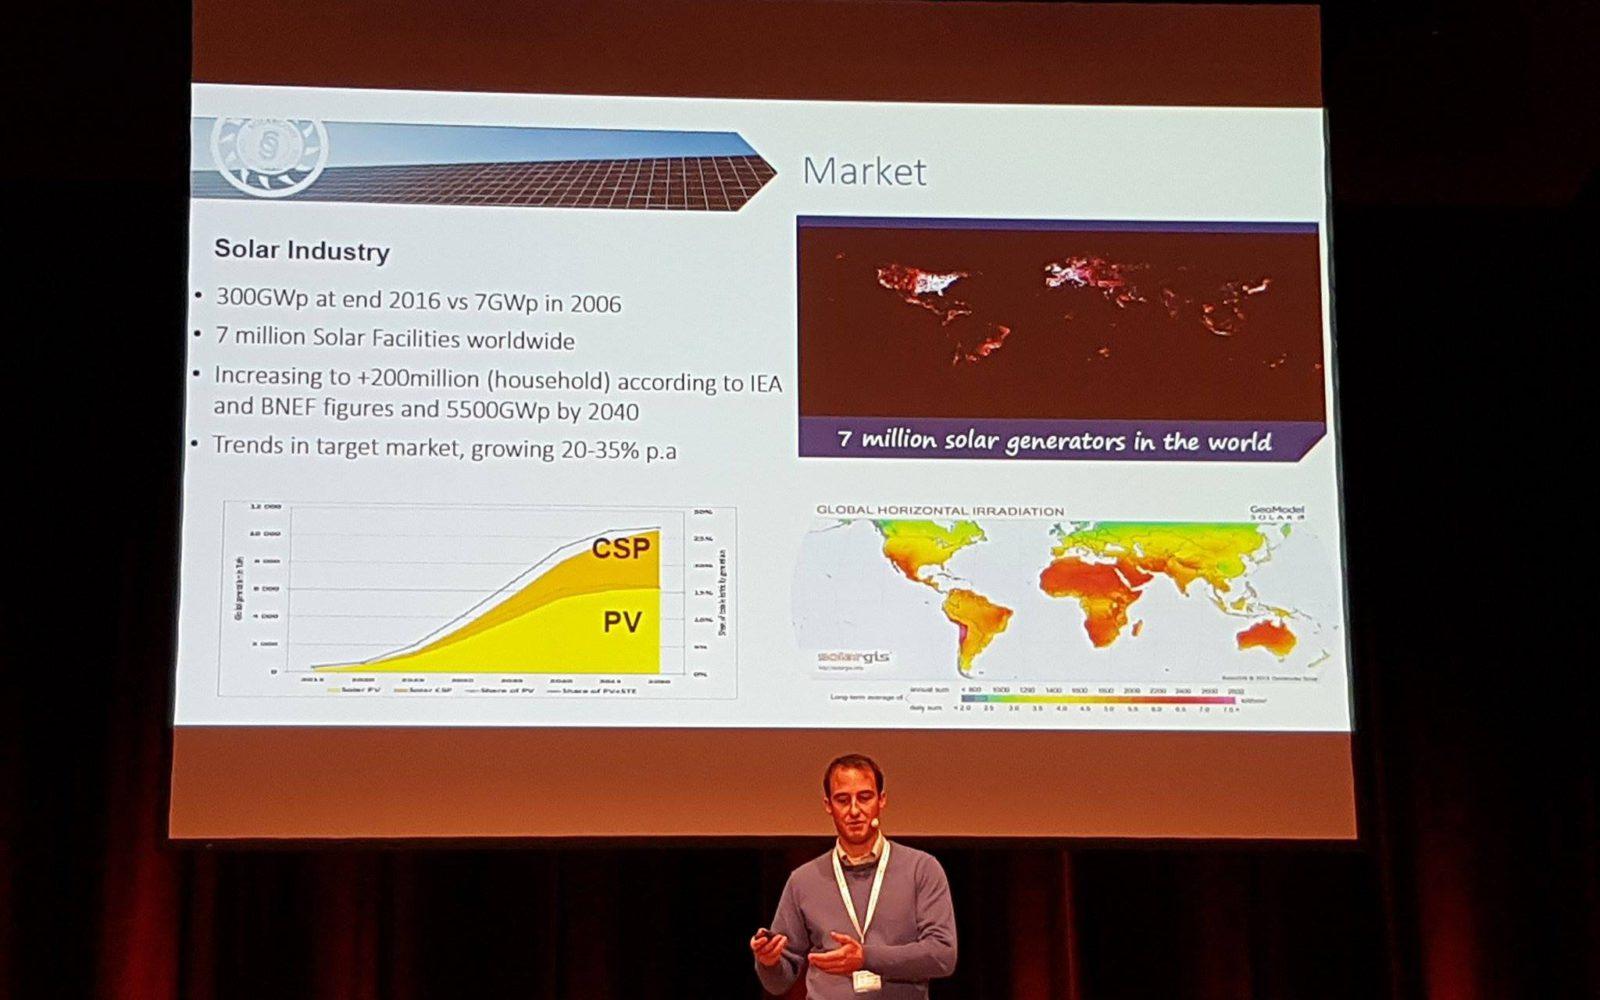 Francois Sonnet – SolarChange Global